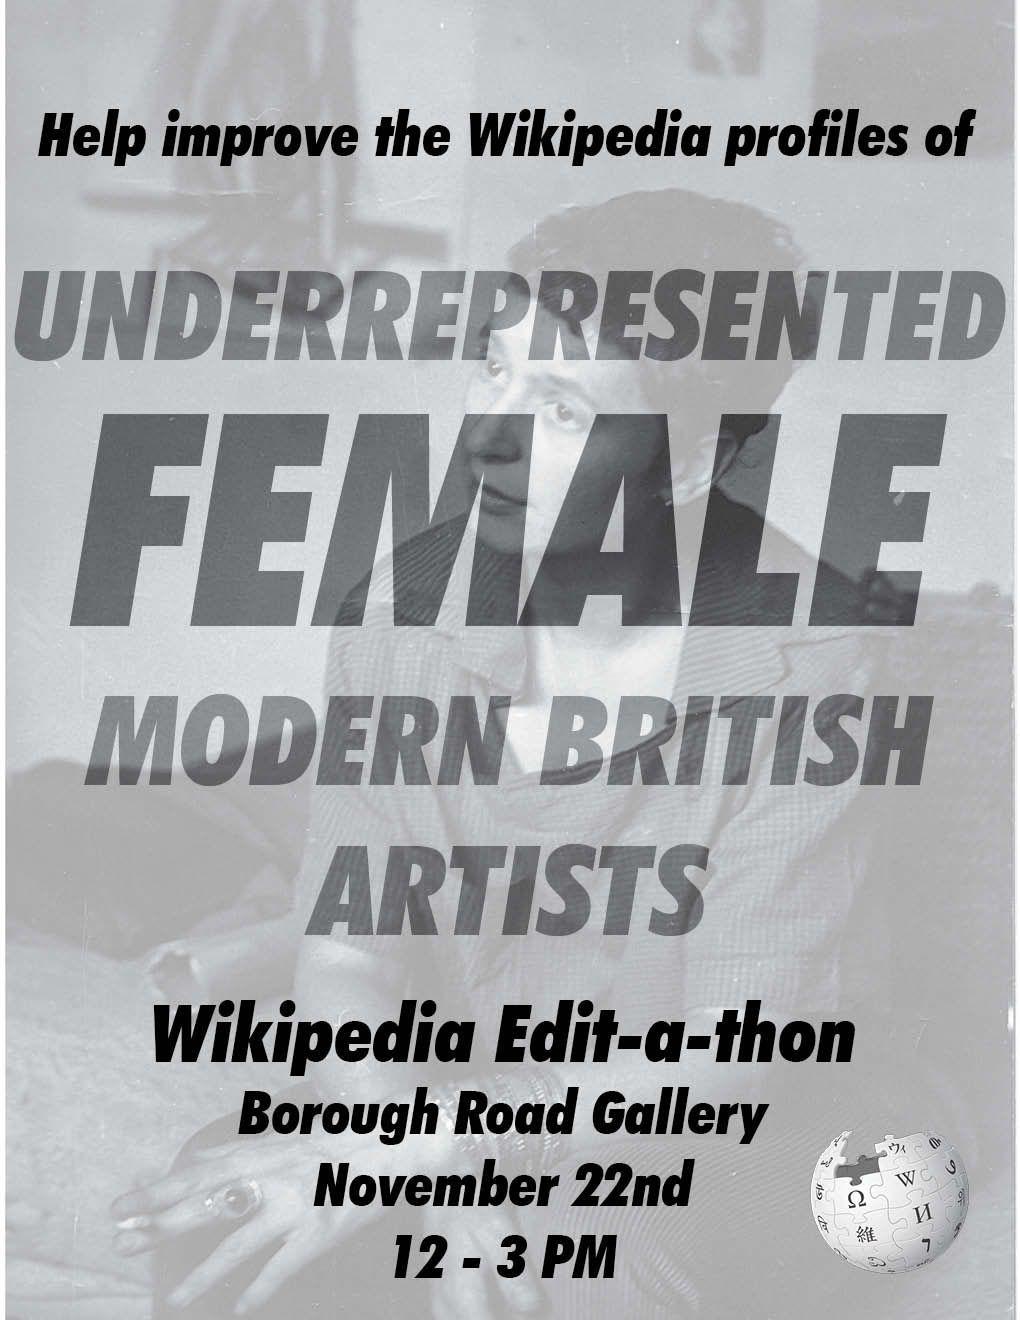 Female Modern British Artists Wikipedia Editathon Workshop